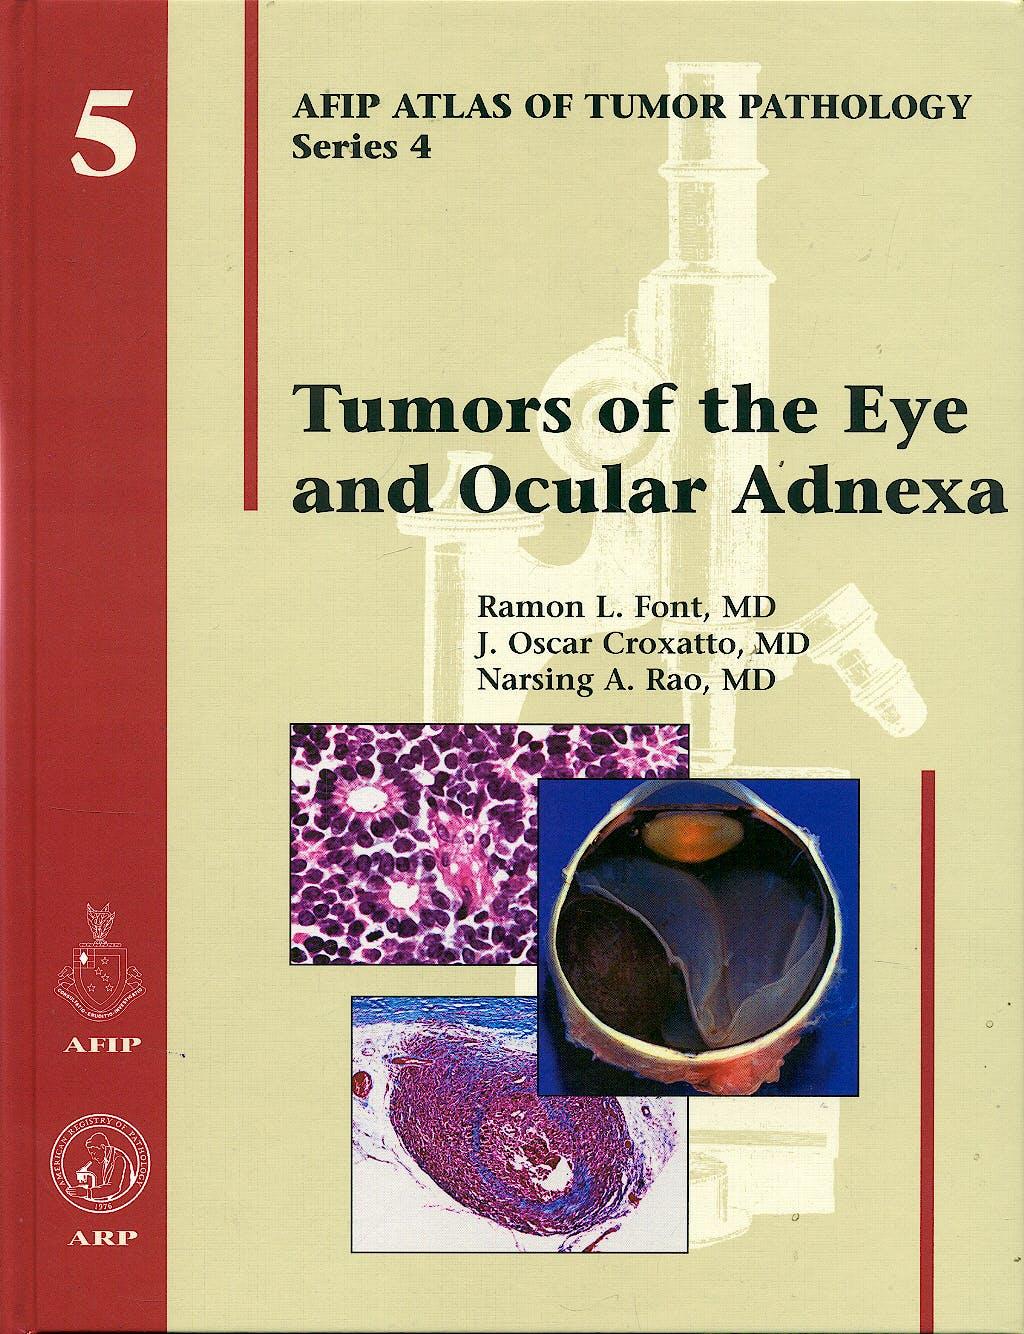 Portada del libro 9781881041993 Tumors of the Eye and Ocular Adnexa (AFIP Atlas of Tumor Pathology Series 4, Vol. 5)